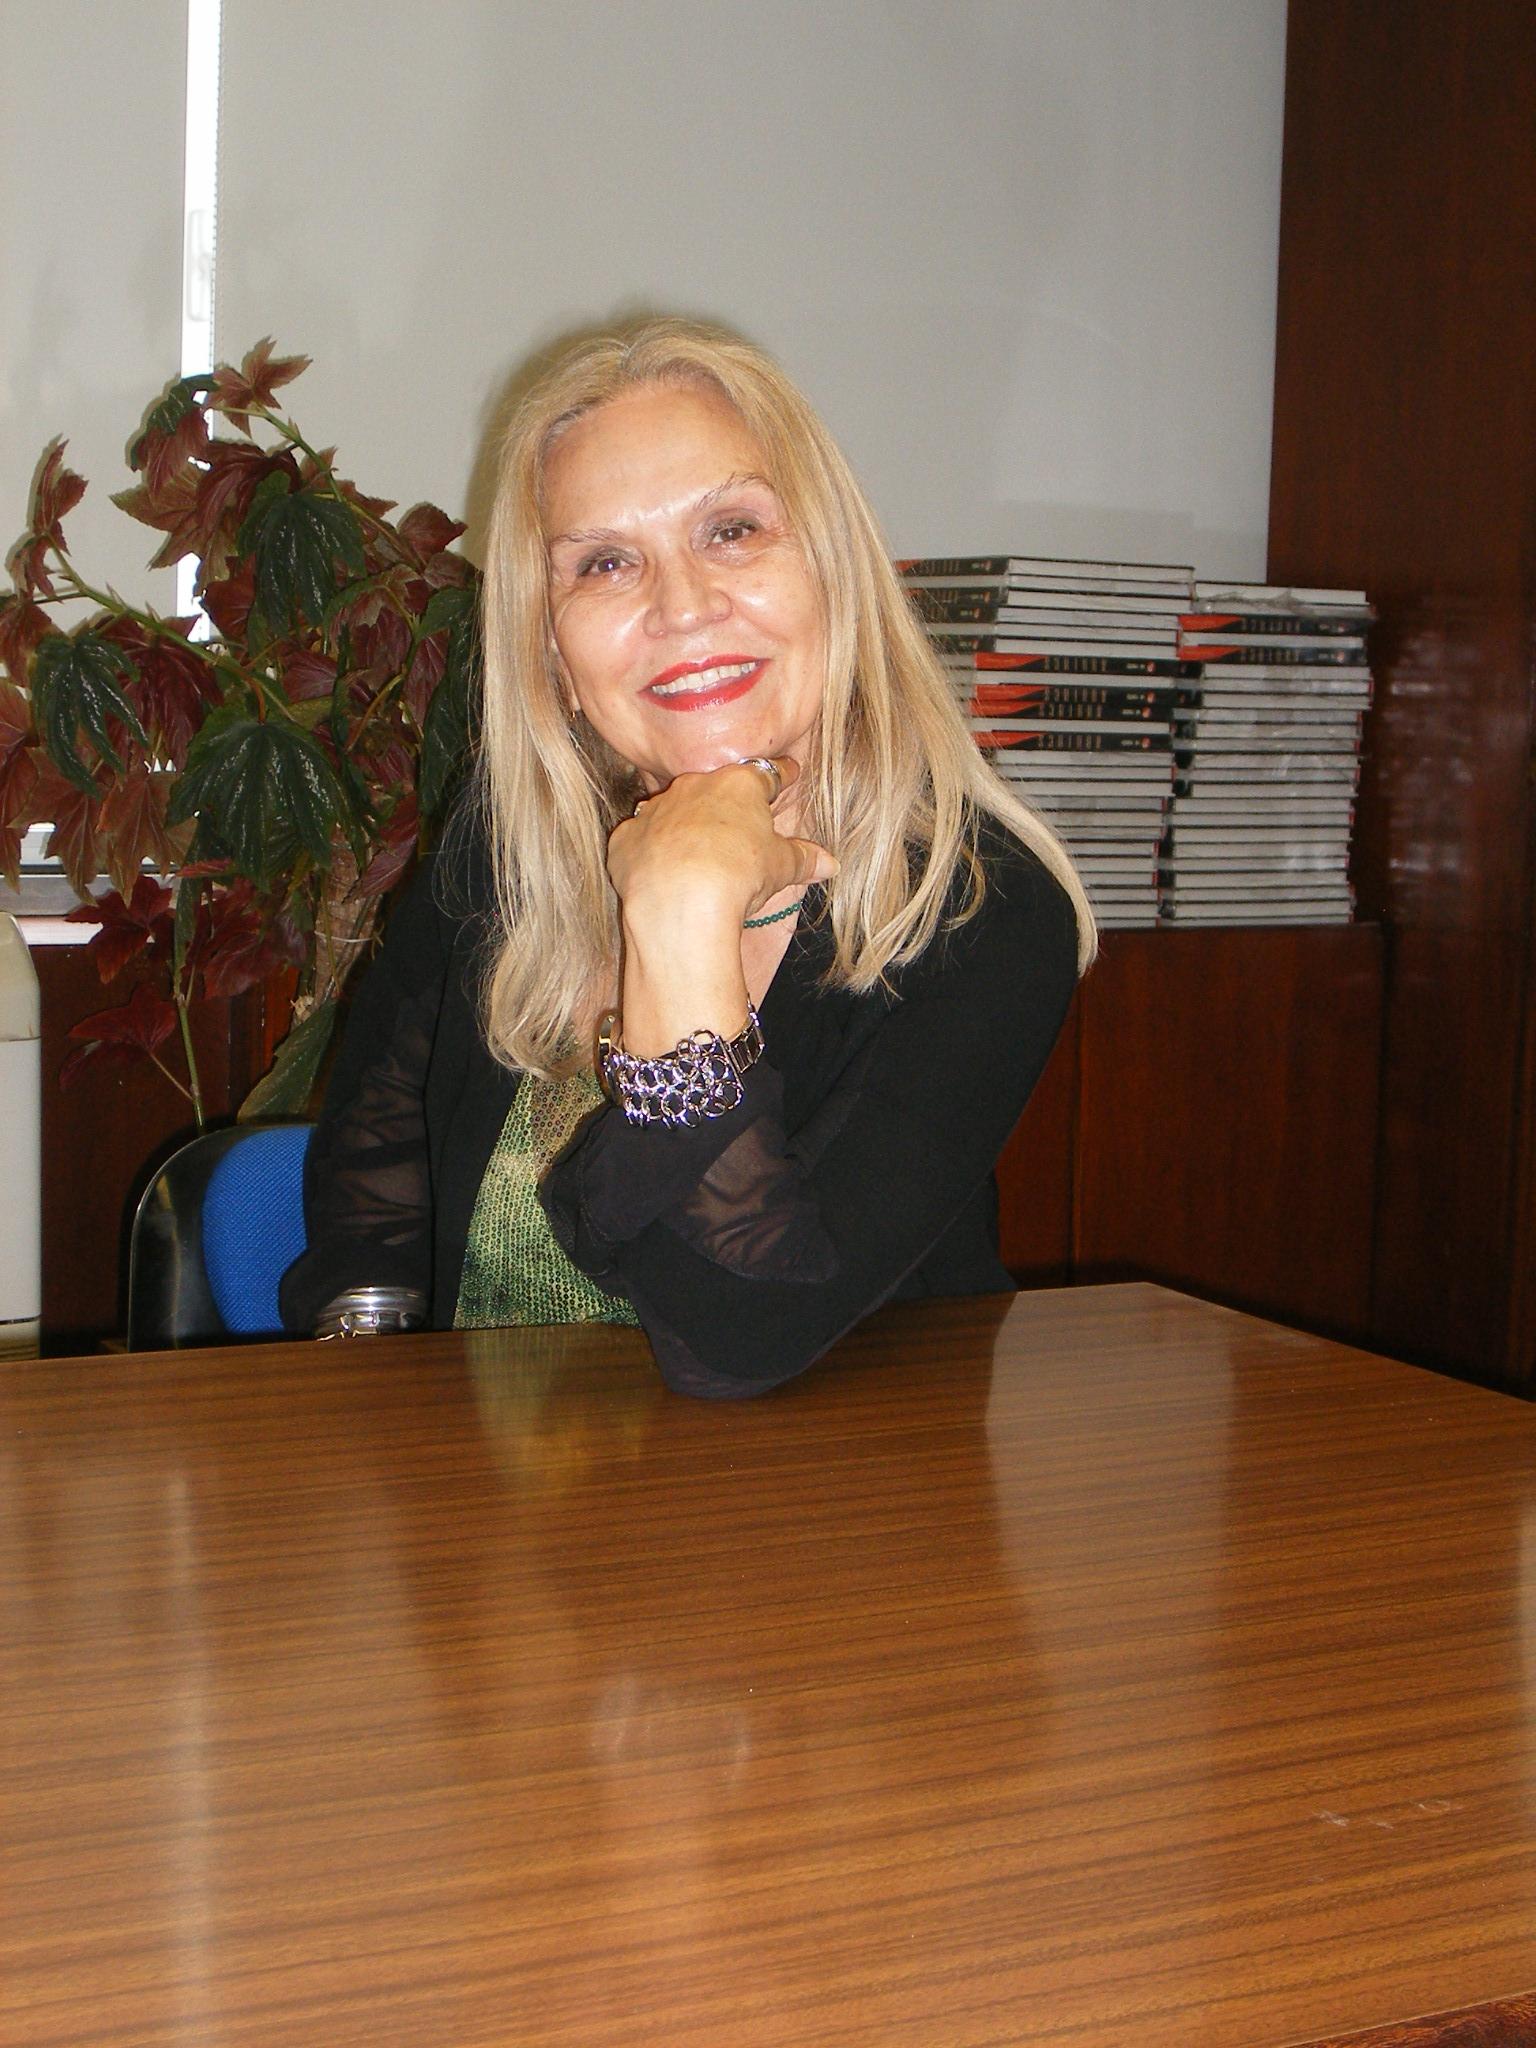 Zélia Mendonça Chamusca